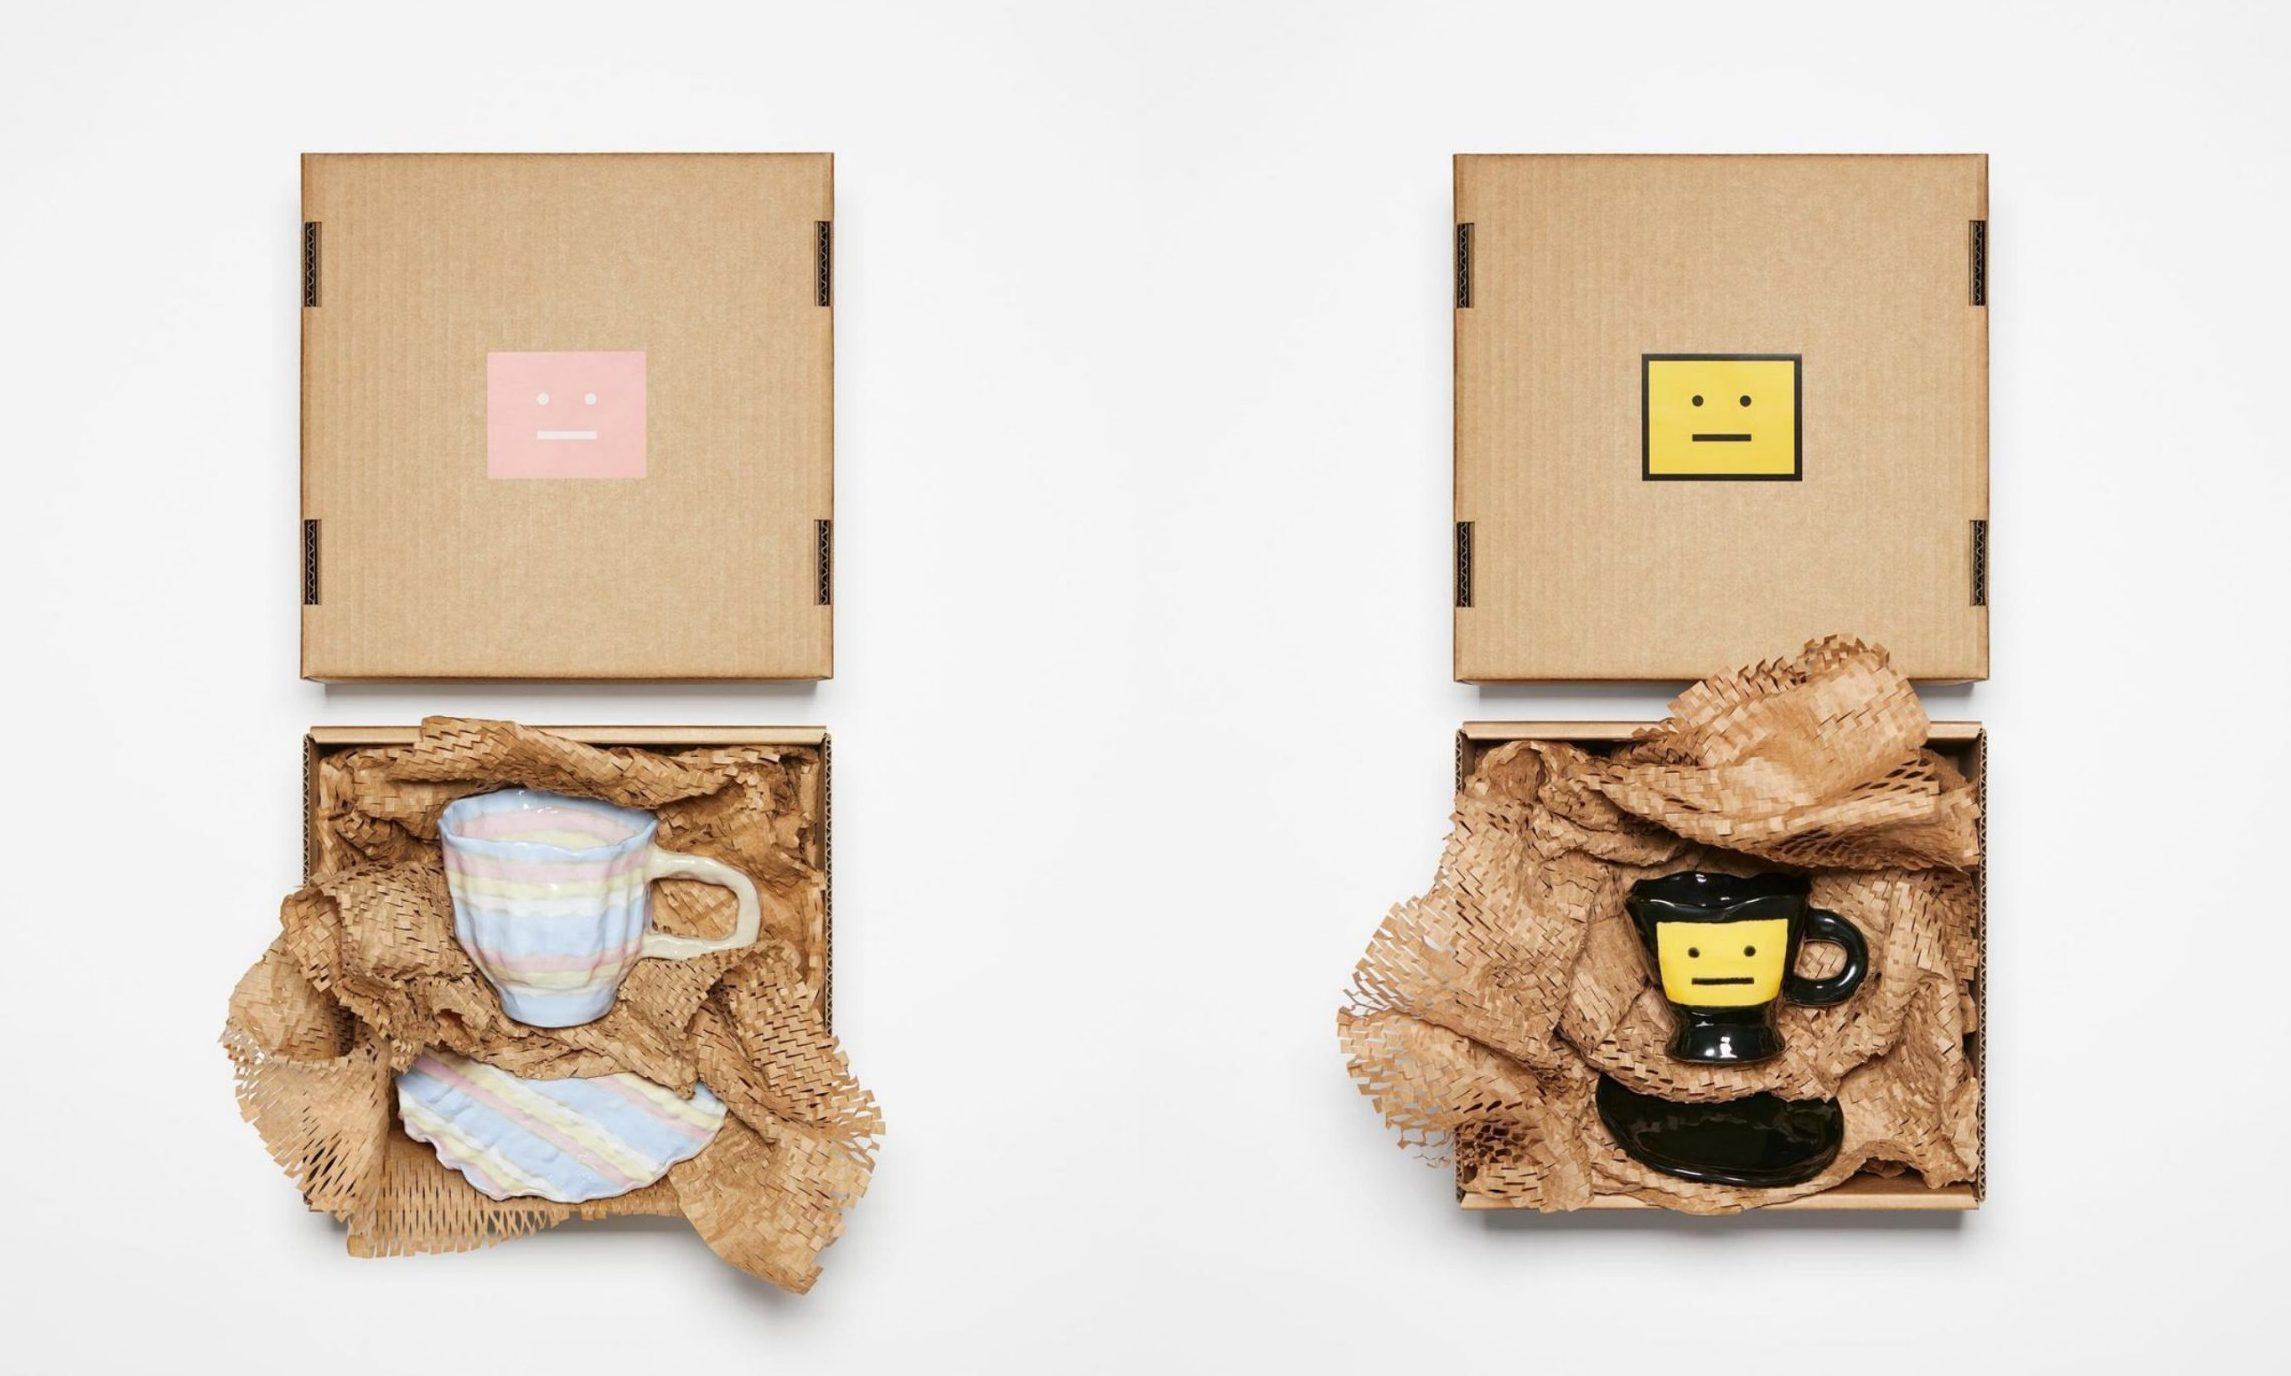 Acne Studios 再度携手艺术家 BETTUNIKA 打造限量杯碟套装